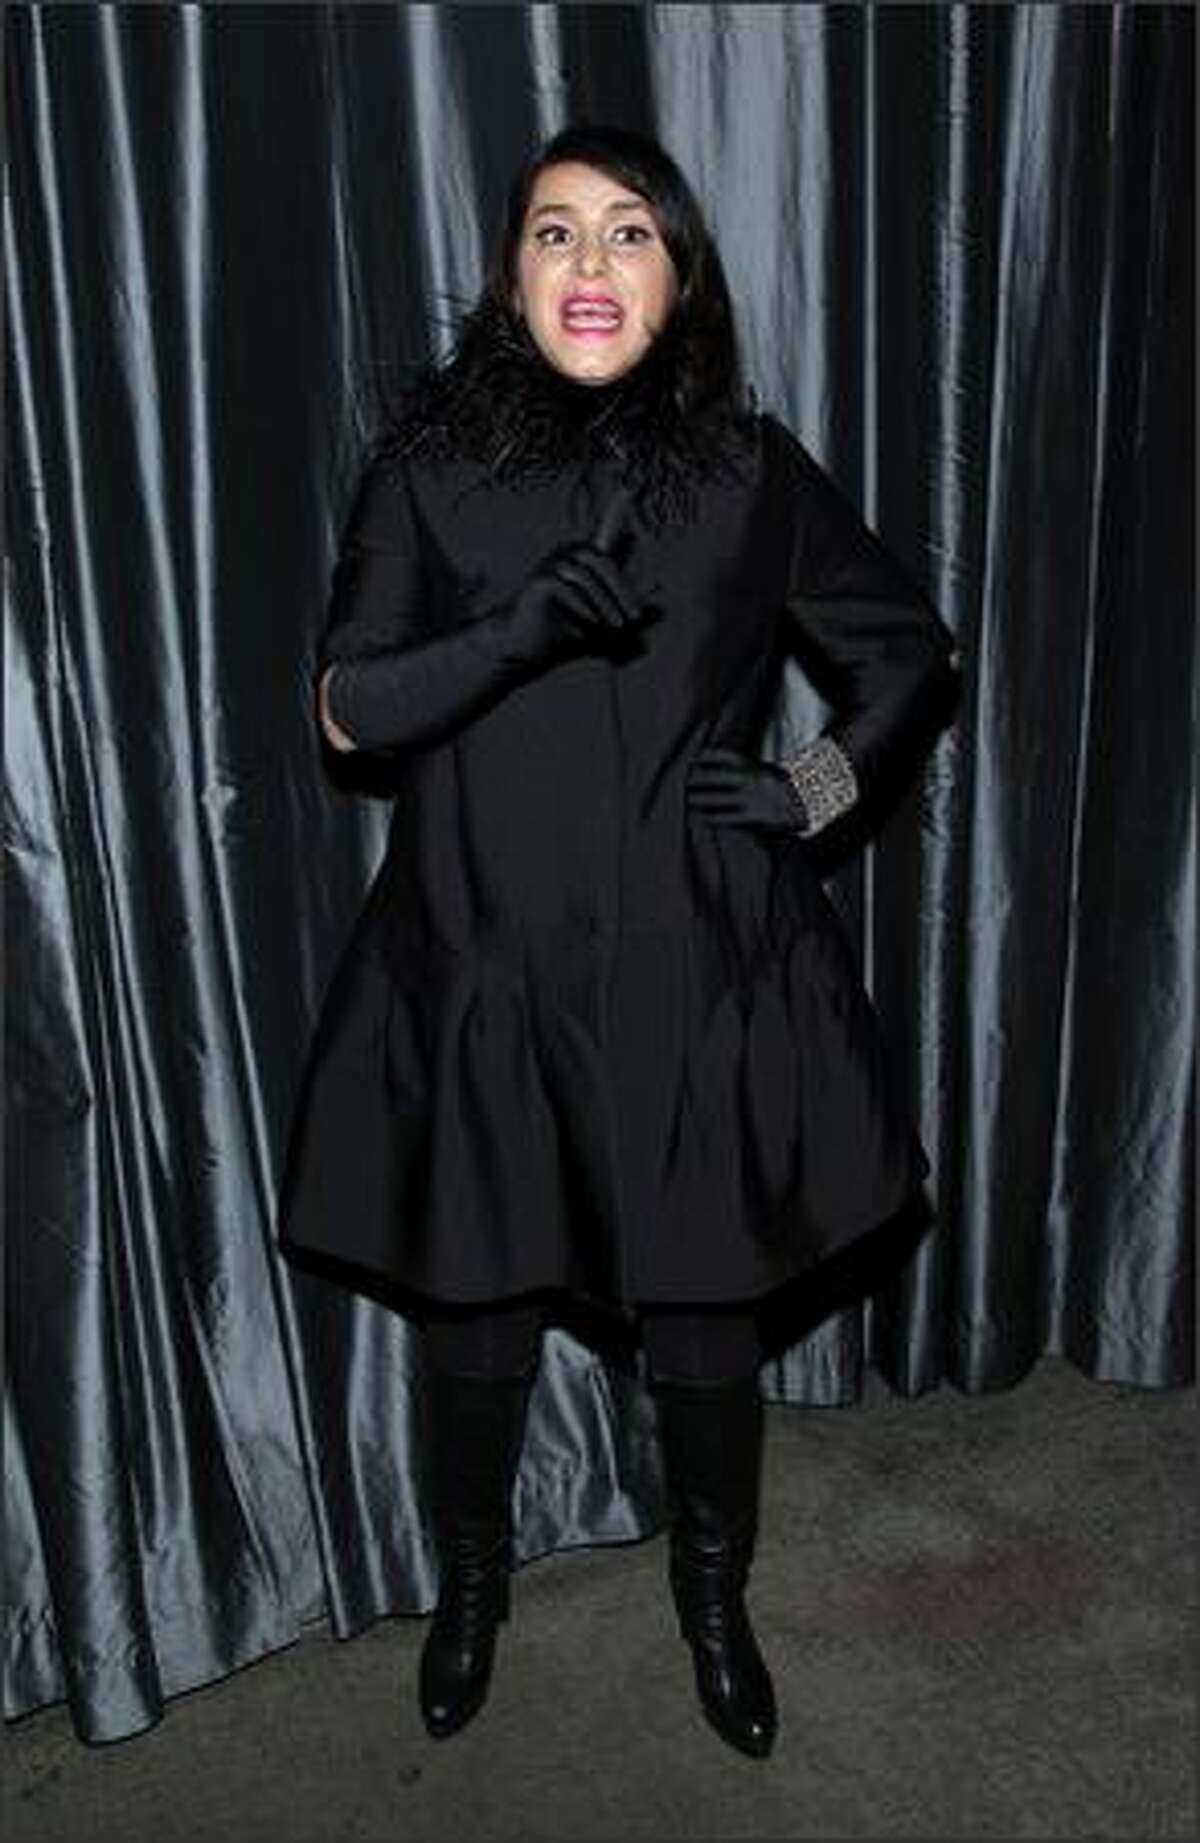 Writer Marjane Satrapi attends the 2007 New York Film Critic's Circle Awards at Spotlight in New York City.